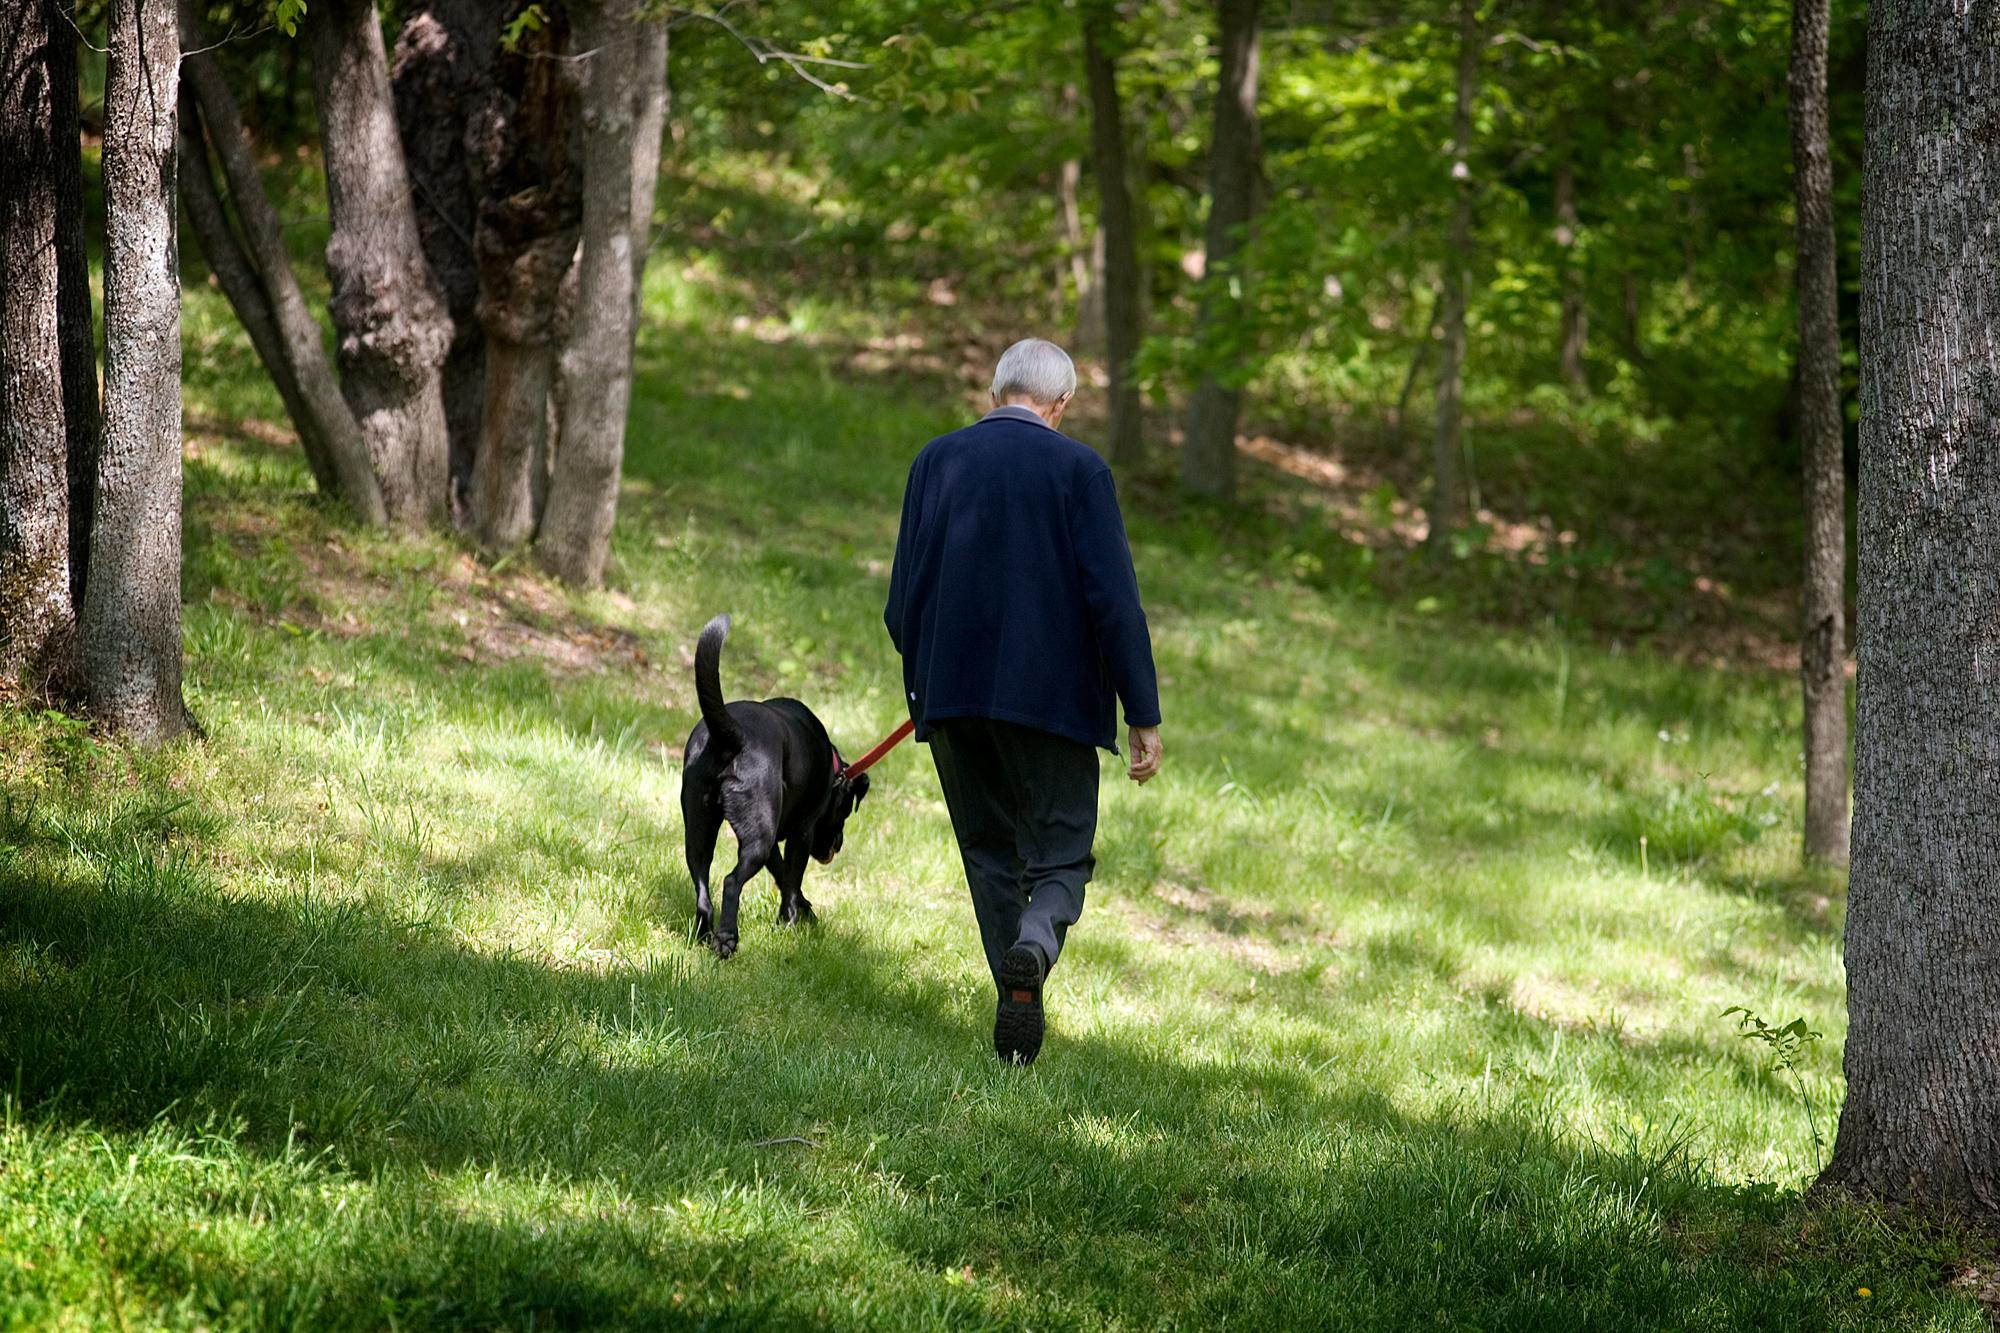 United Methodist Bishop Rueben P. Job walks his dog, Dakota, at his home near Nashville, Tenn. Photo by Mike DuBose, UMNS